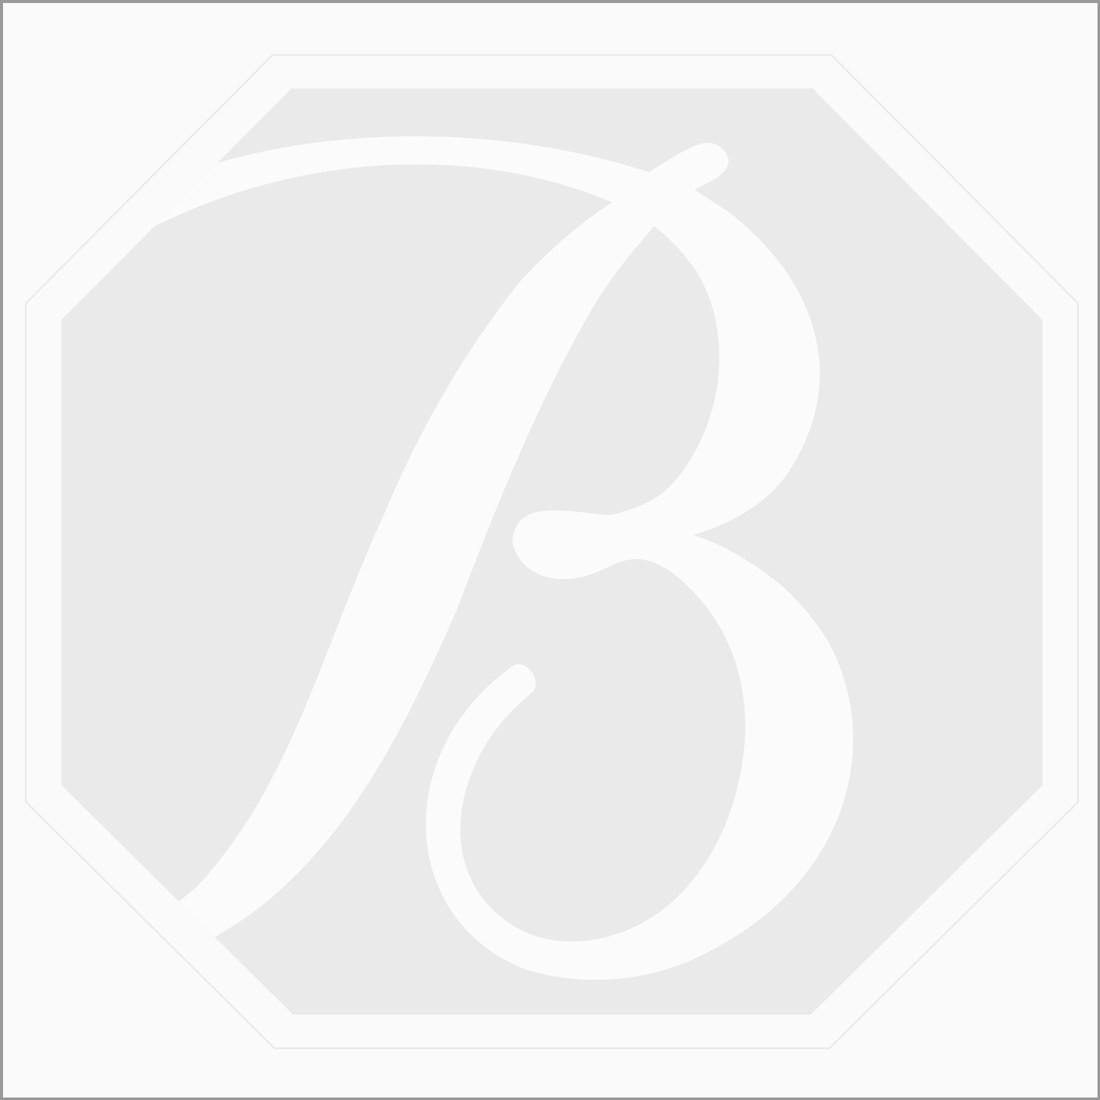 6.65 ct. Oval (-) White Rose Cut Diamond Photograph